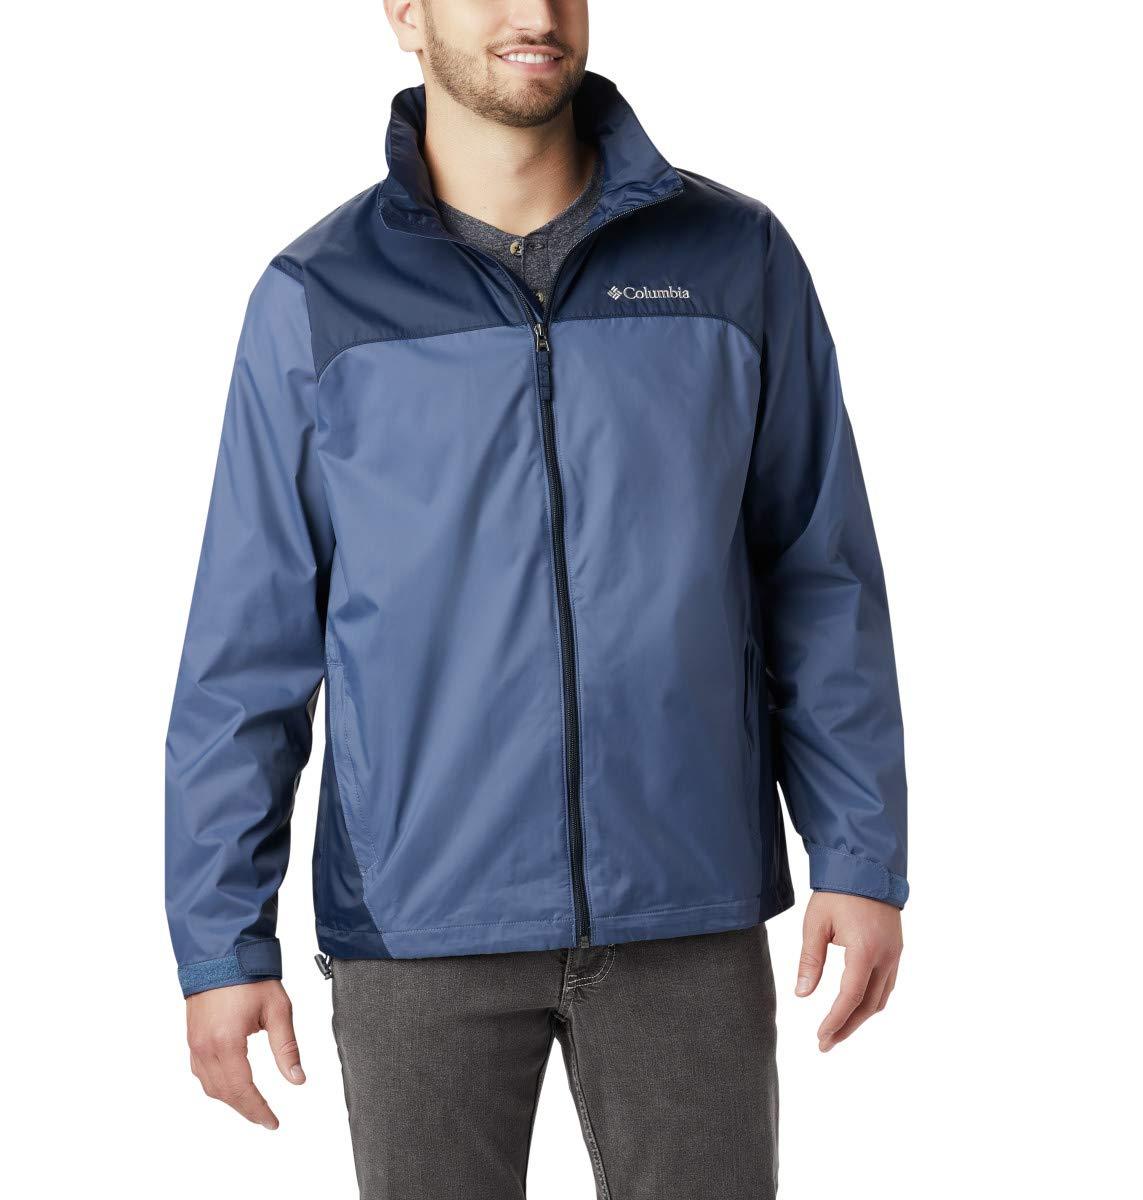 Columbia Men's Glennaker Lake Rain Jacket, Dark Mountain/Collegiate Navy, X-Large by Columbia